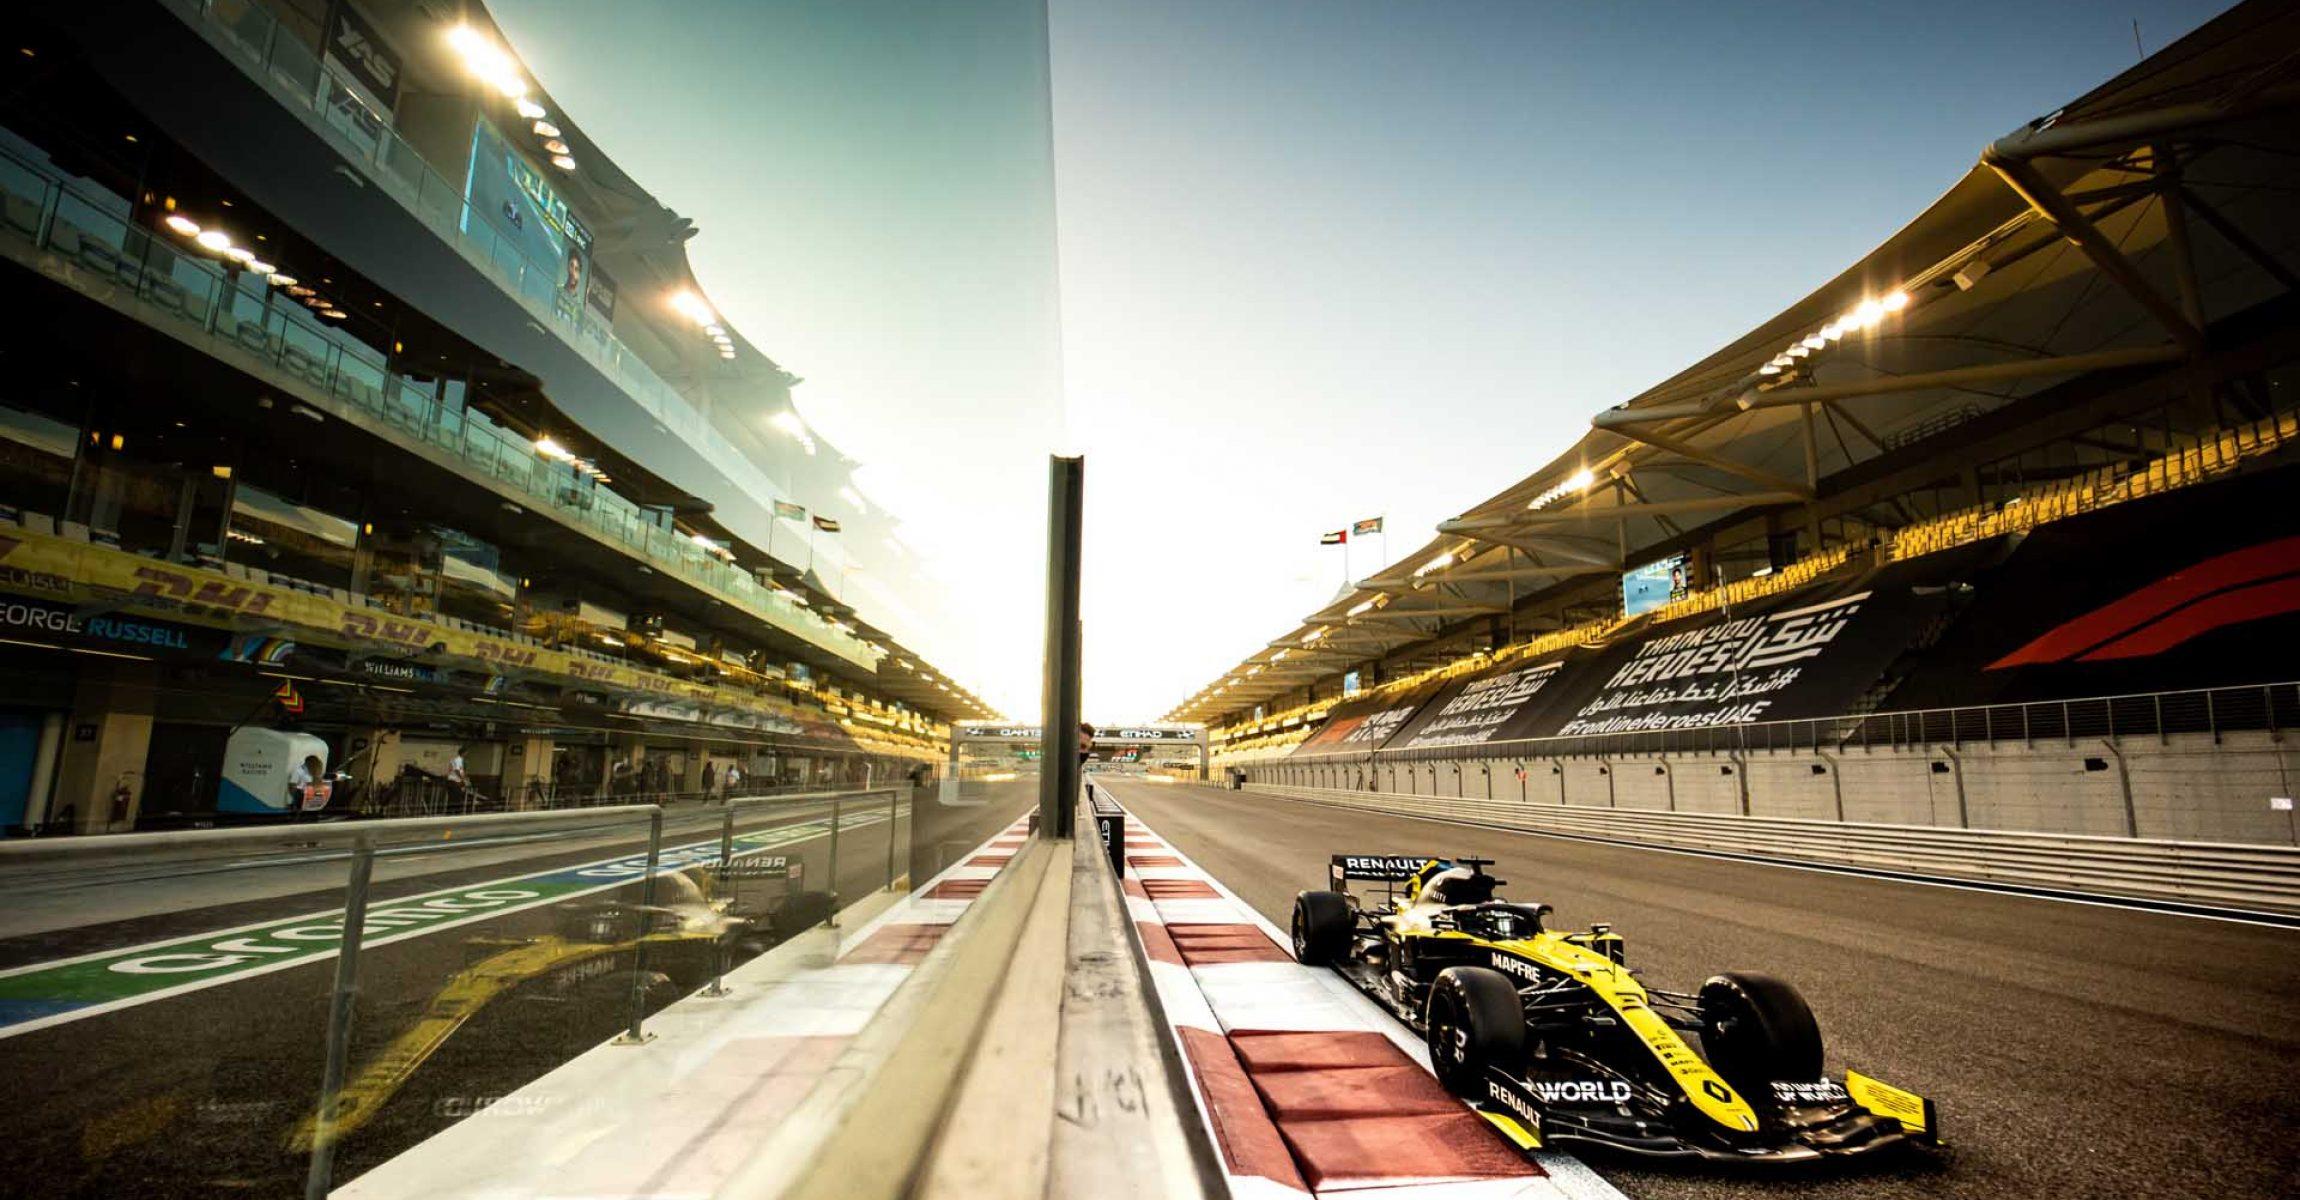 Daniel Ricciardo (AUS) Renault F1 Team RS20. Abu Dhabi Grand Prix, Friday 11th December 2020. Yas Marina Circuit, Abu Dhabi, UAE.